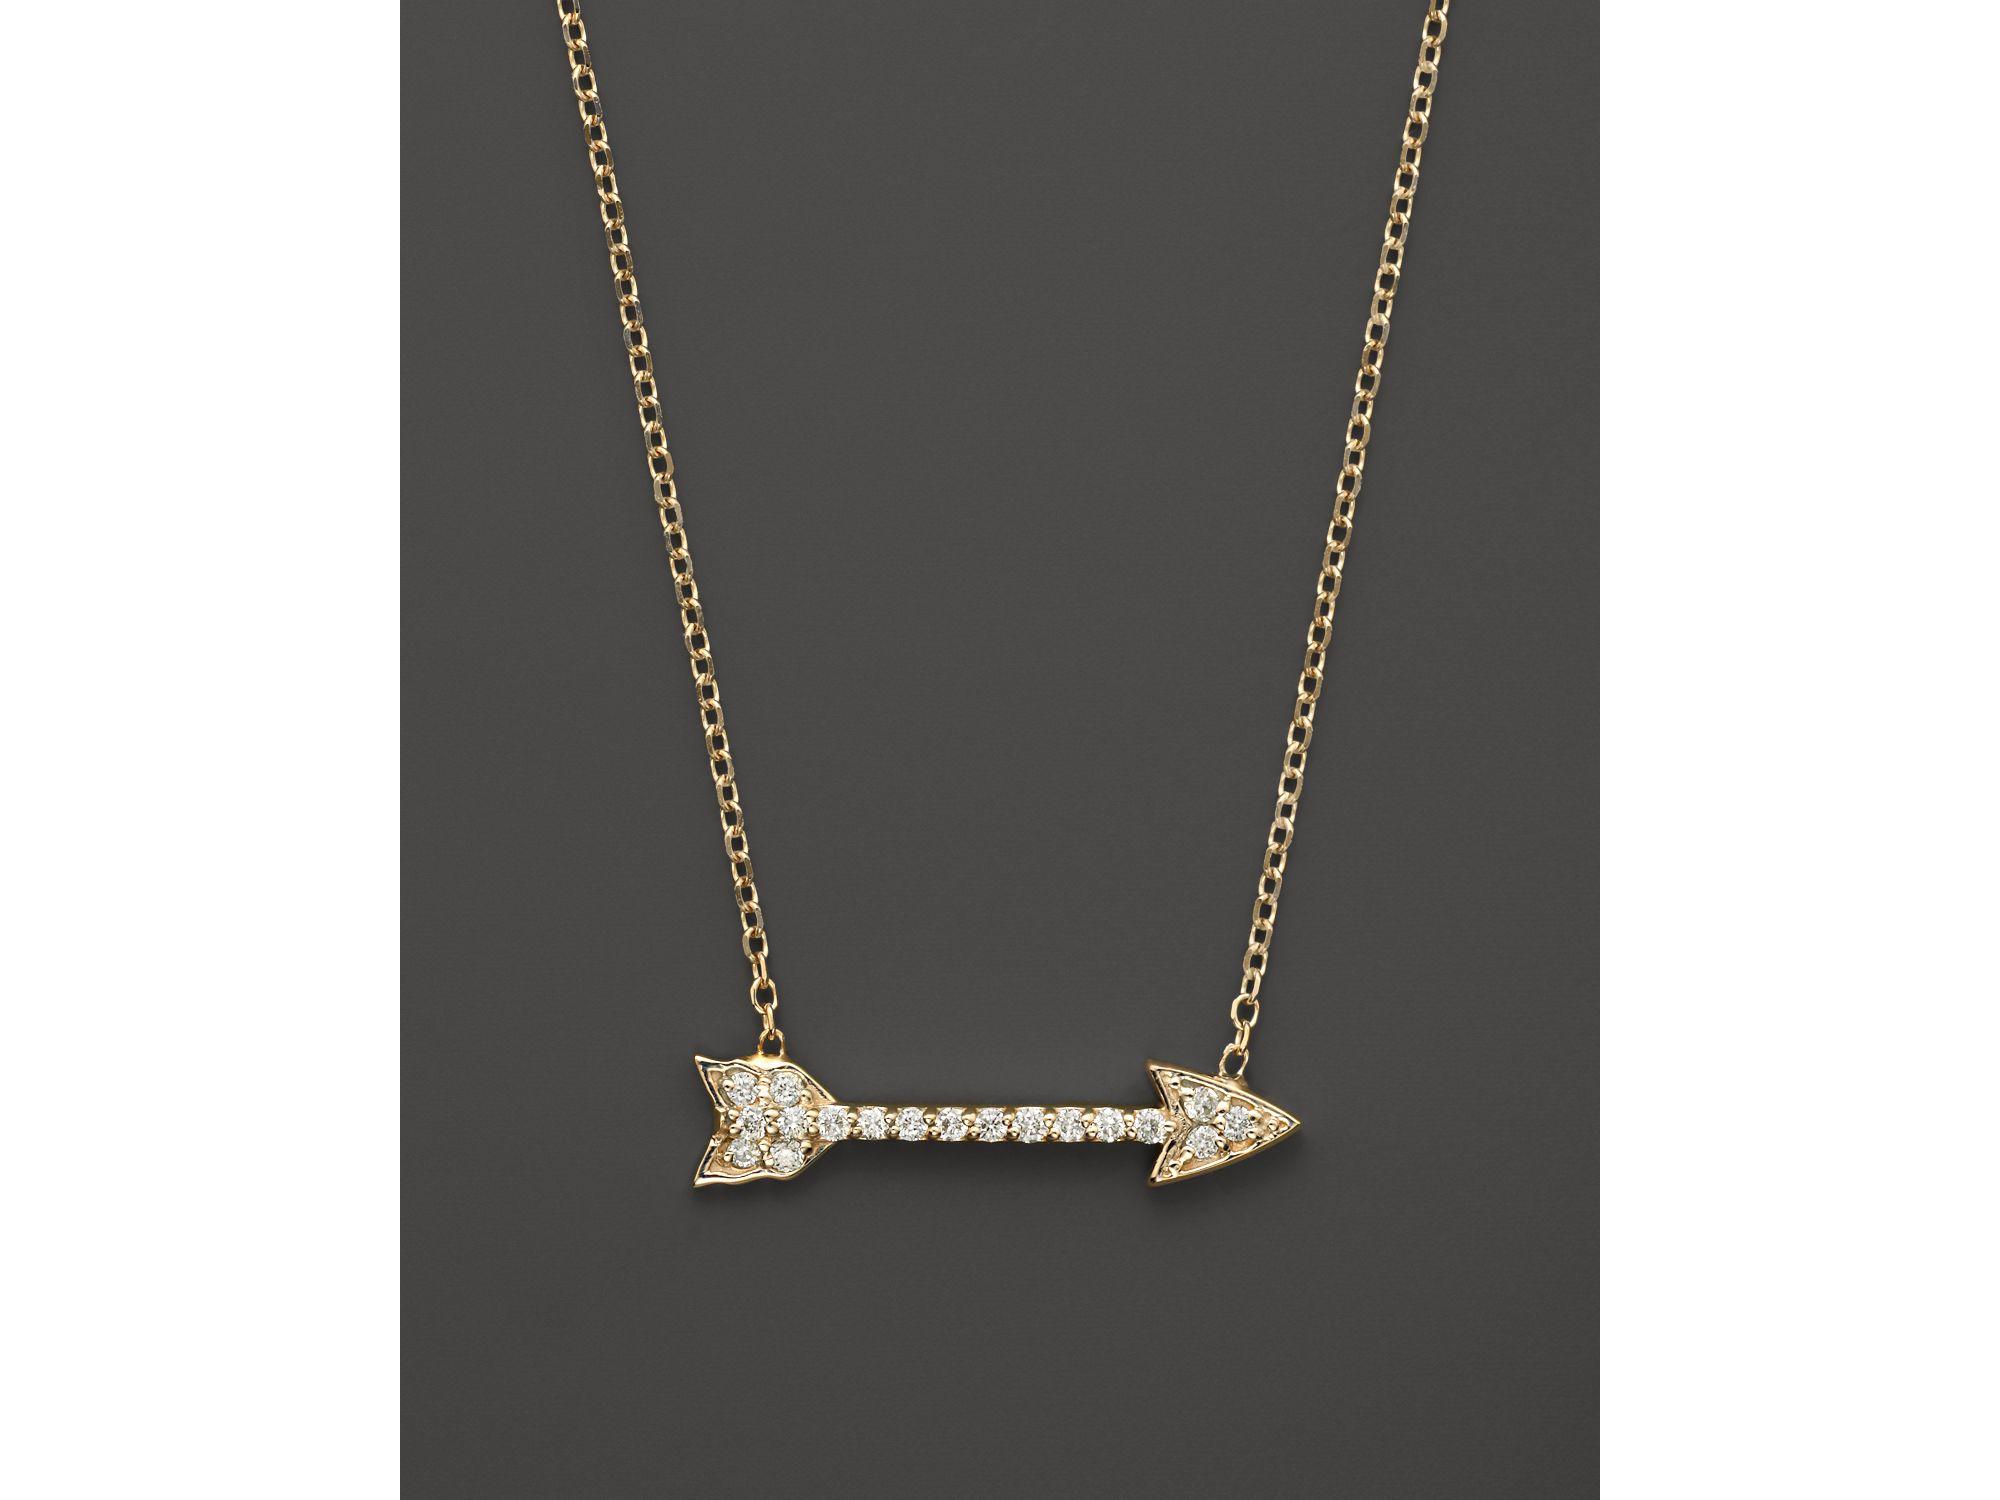 77d5ec23e012 KC Designs Small Diamond Arrow Pendant Necklace In 14k Yellow Gold ...